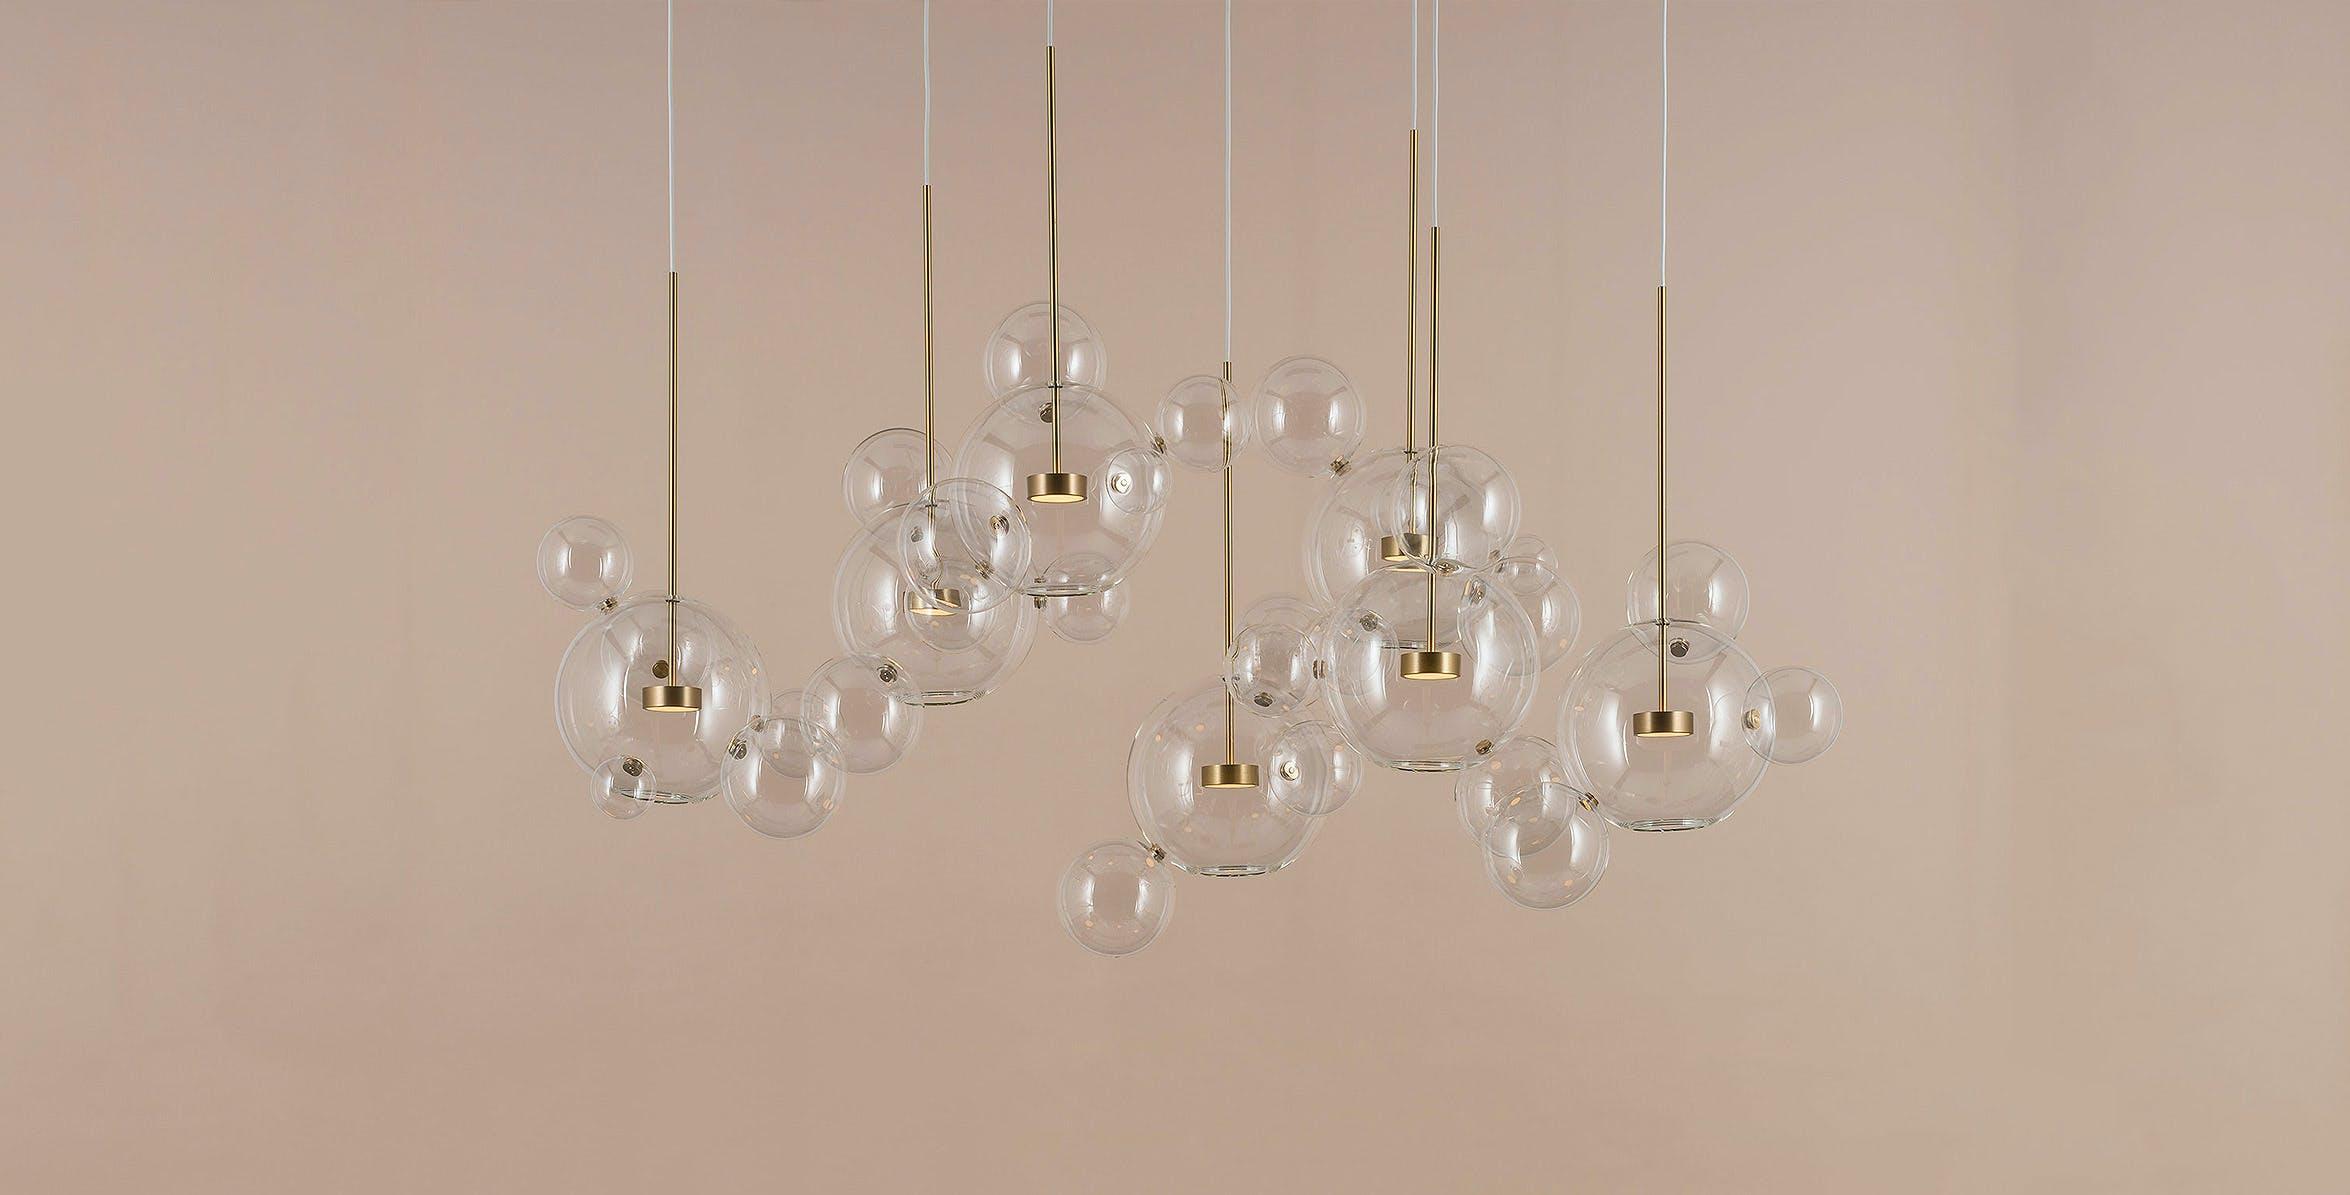 Giopato And Coombes Lighting